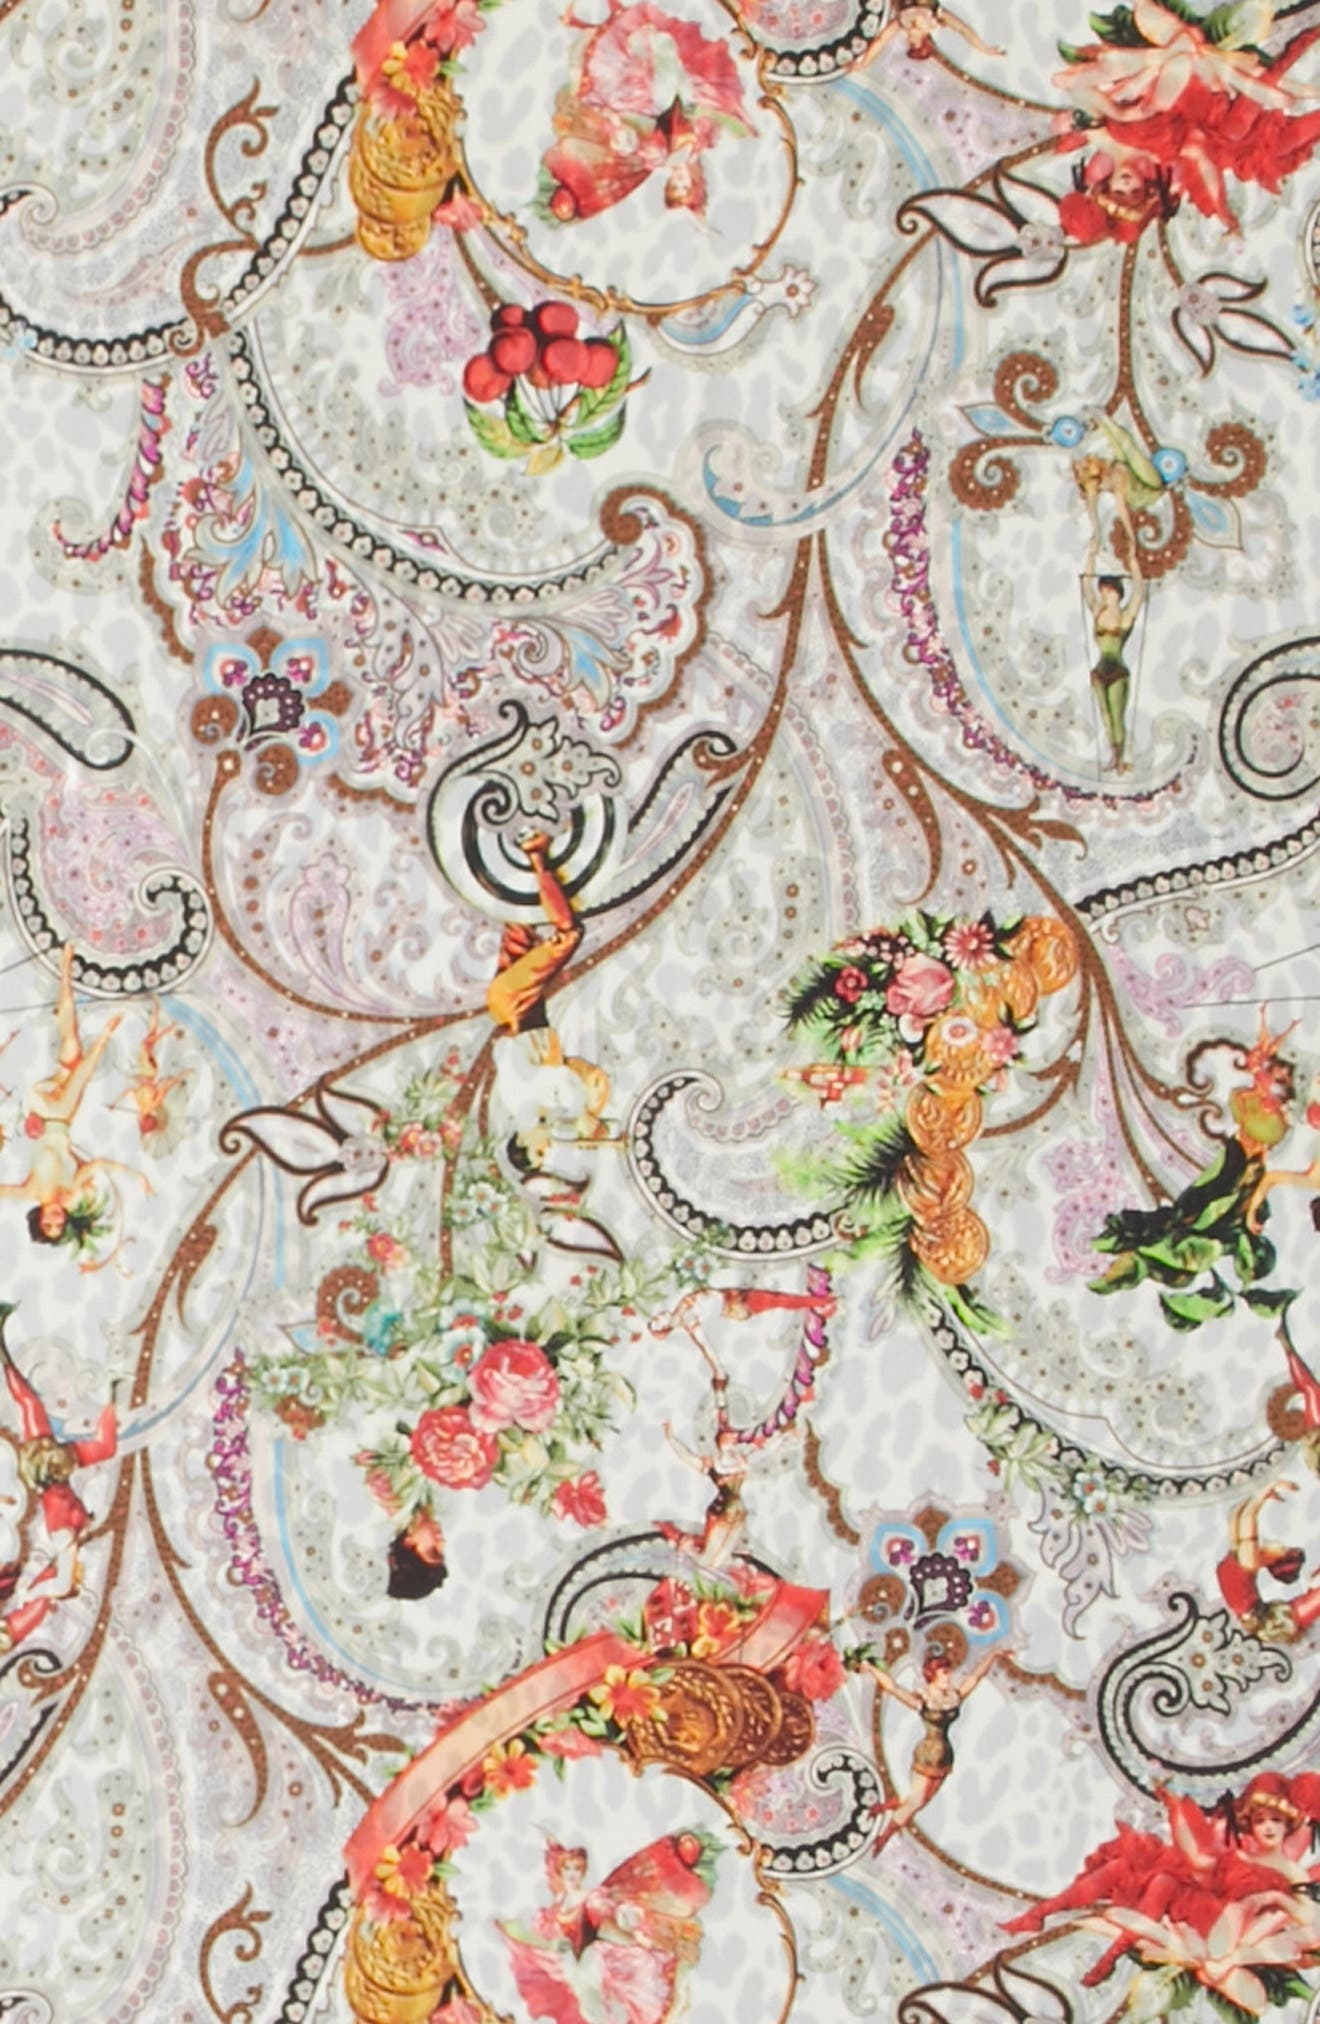 Dancer Paisley Reversible Silk Scarf,                             Alternate thumbnail 4, color,                             White